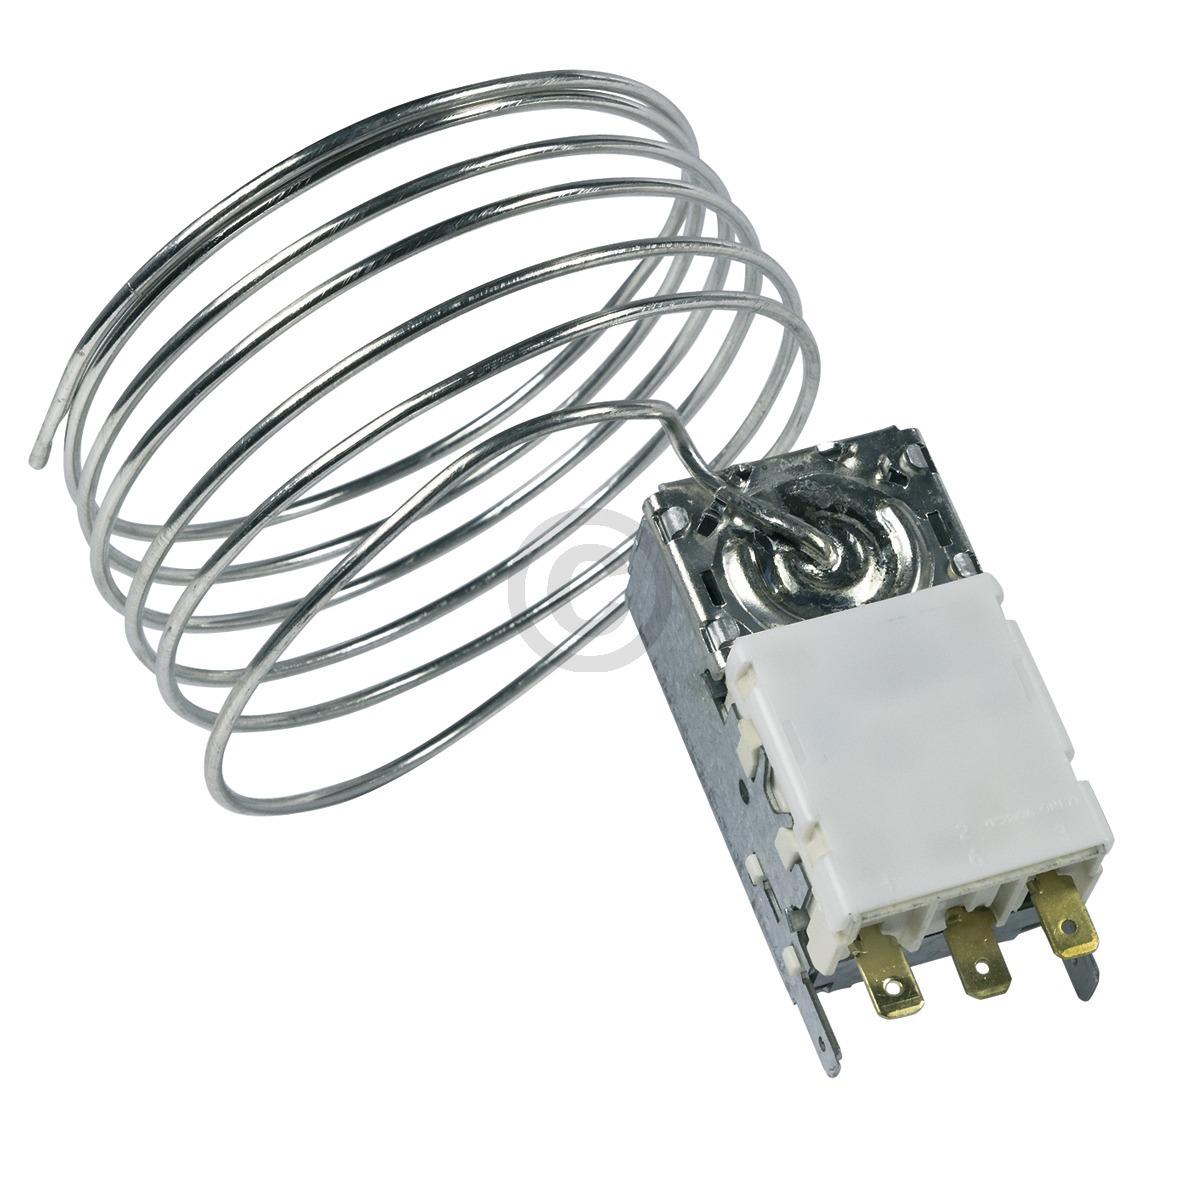 Thermostat Ranco VI112 K59-H2805 Universal für Kühlschrank 2Sterne 3Sterne mir